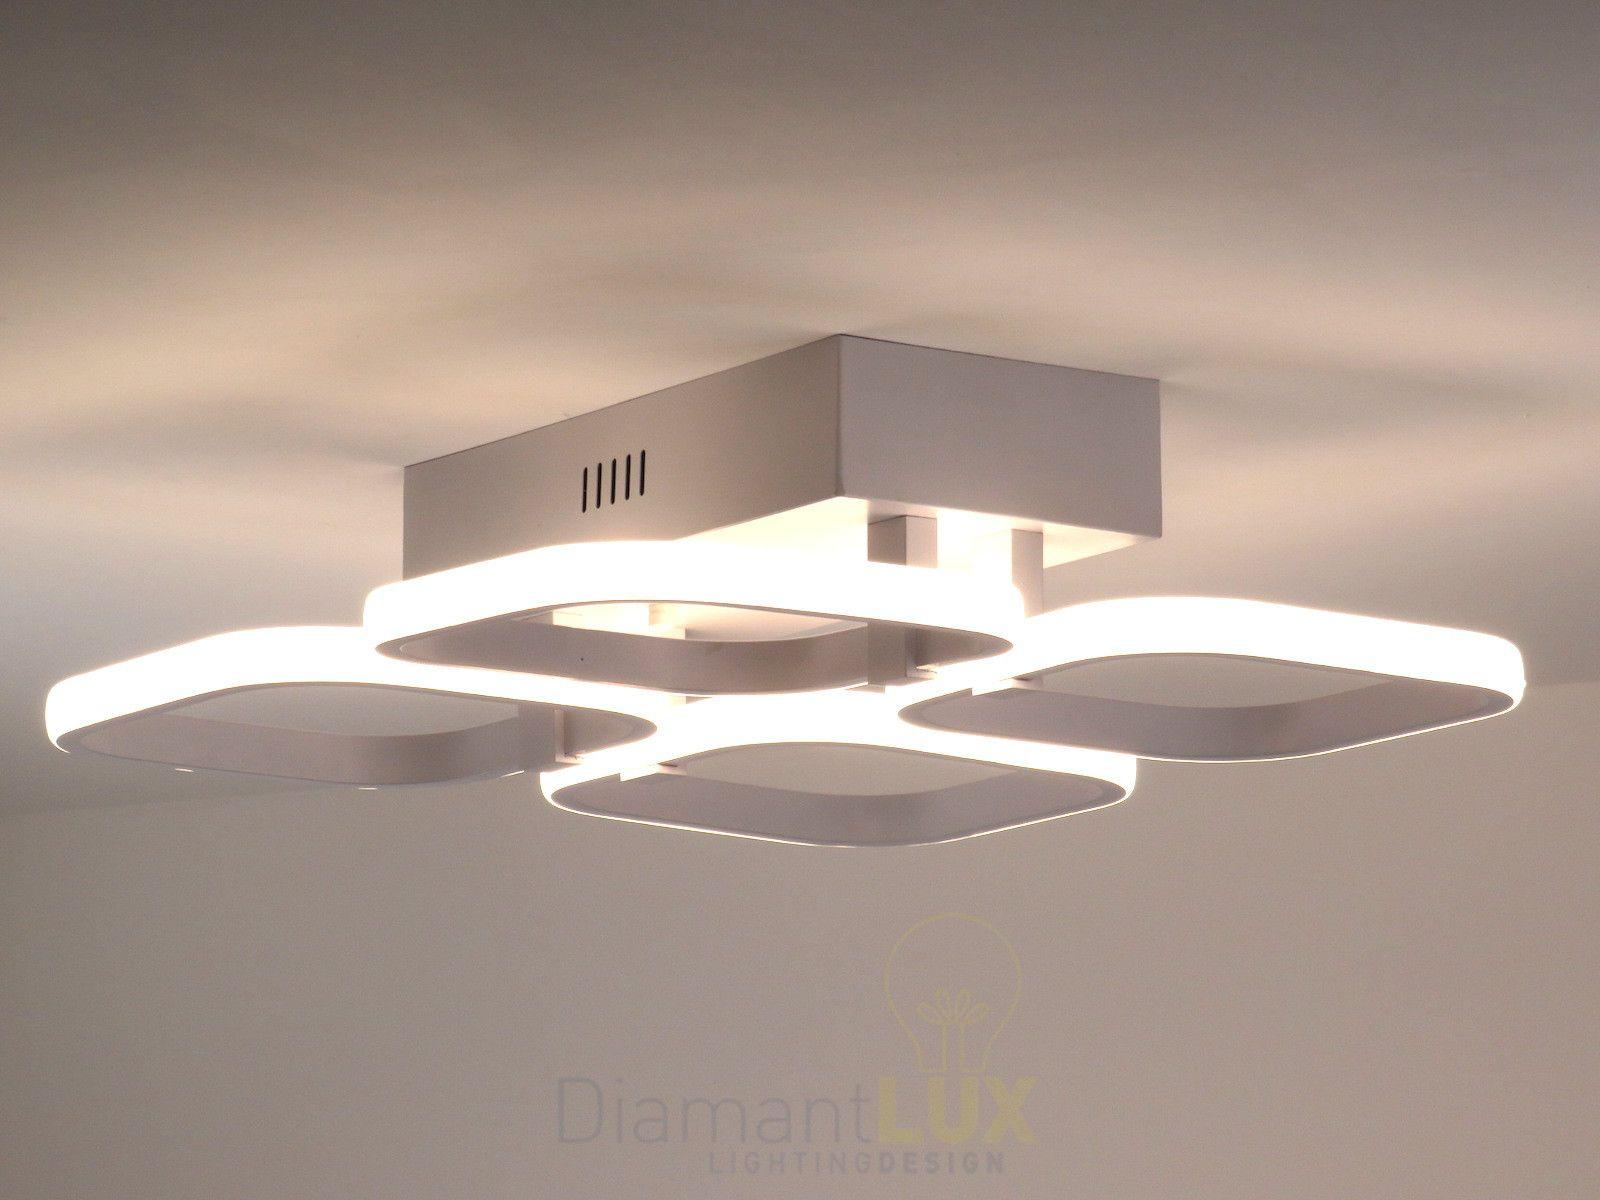 Lampadari E Plafoniere Moderne : Lampadario plafoniera led bianco onde luminose cerchi